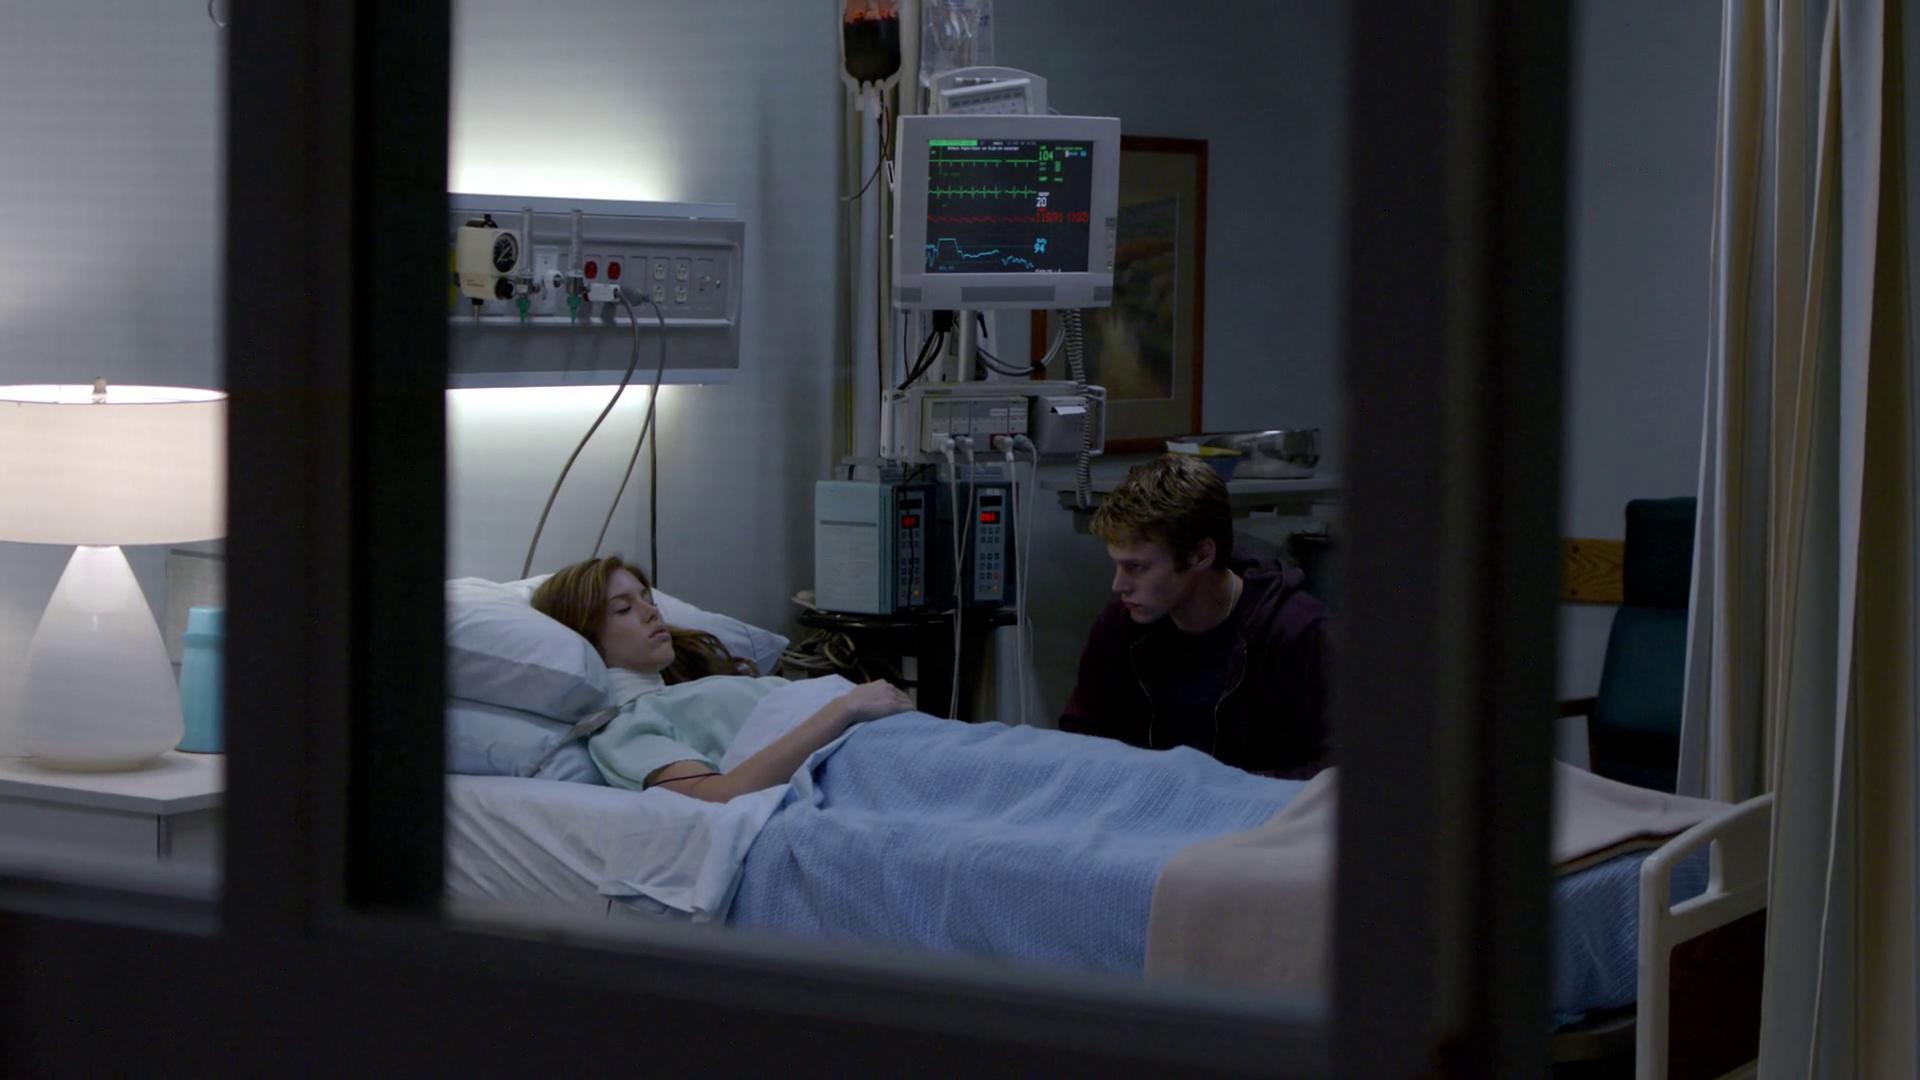 Vampire diaries bedroom - 101 149 Matt Vicki Mf Hospital Png